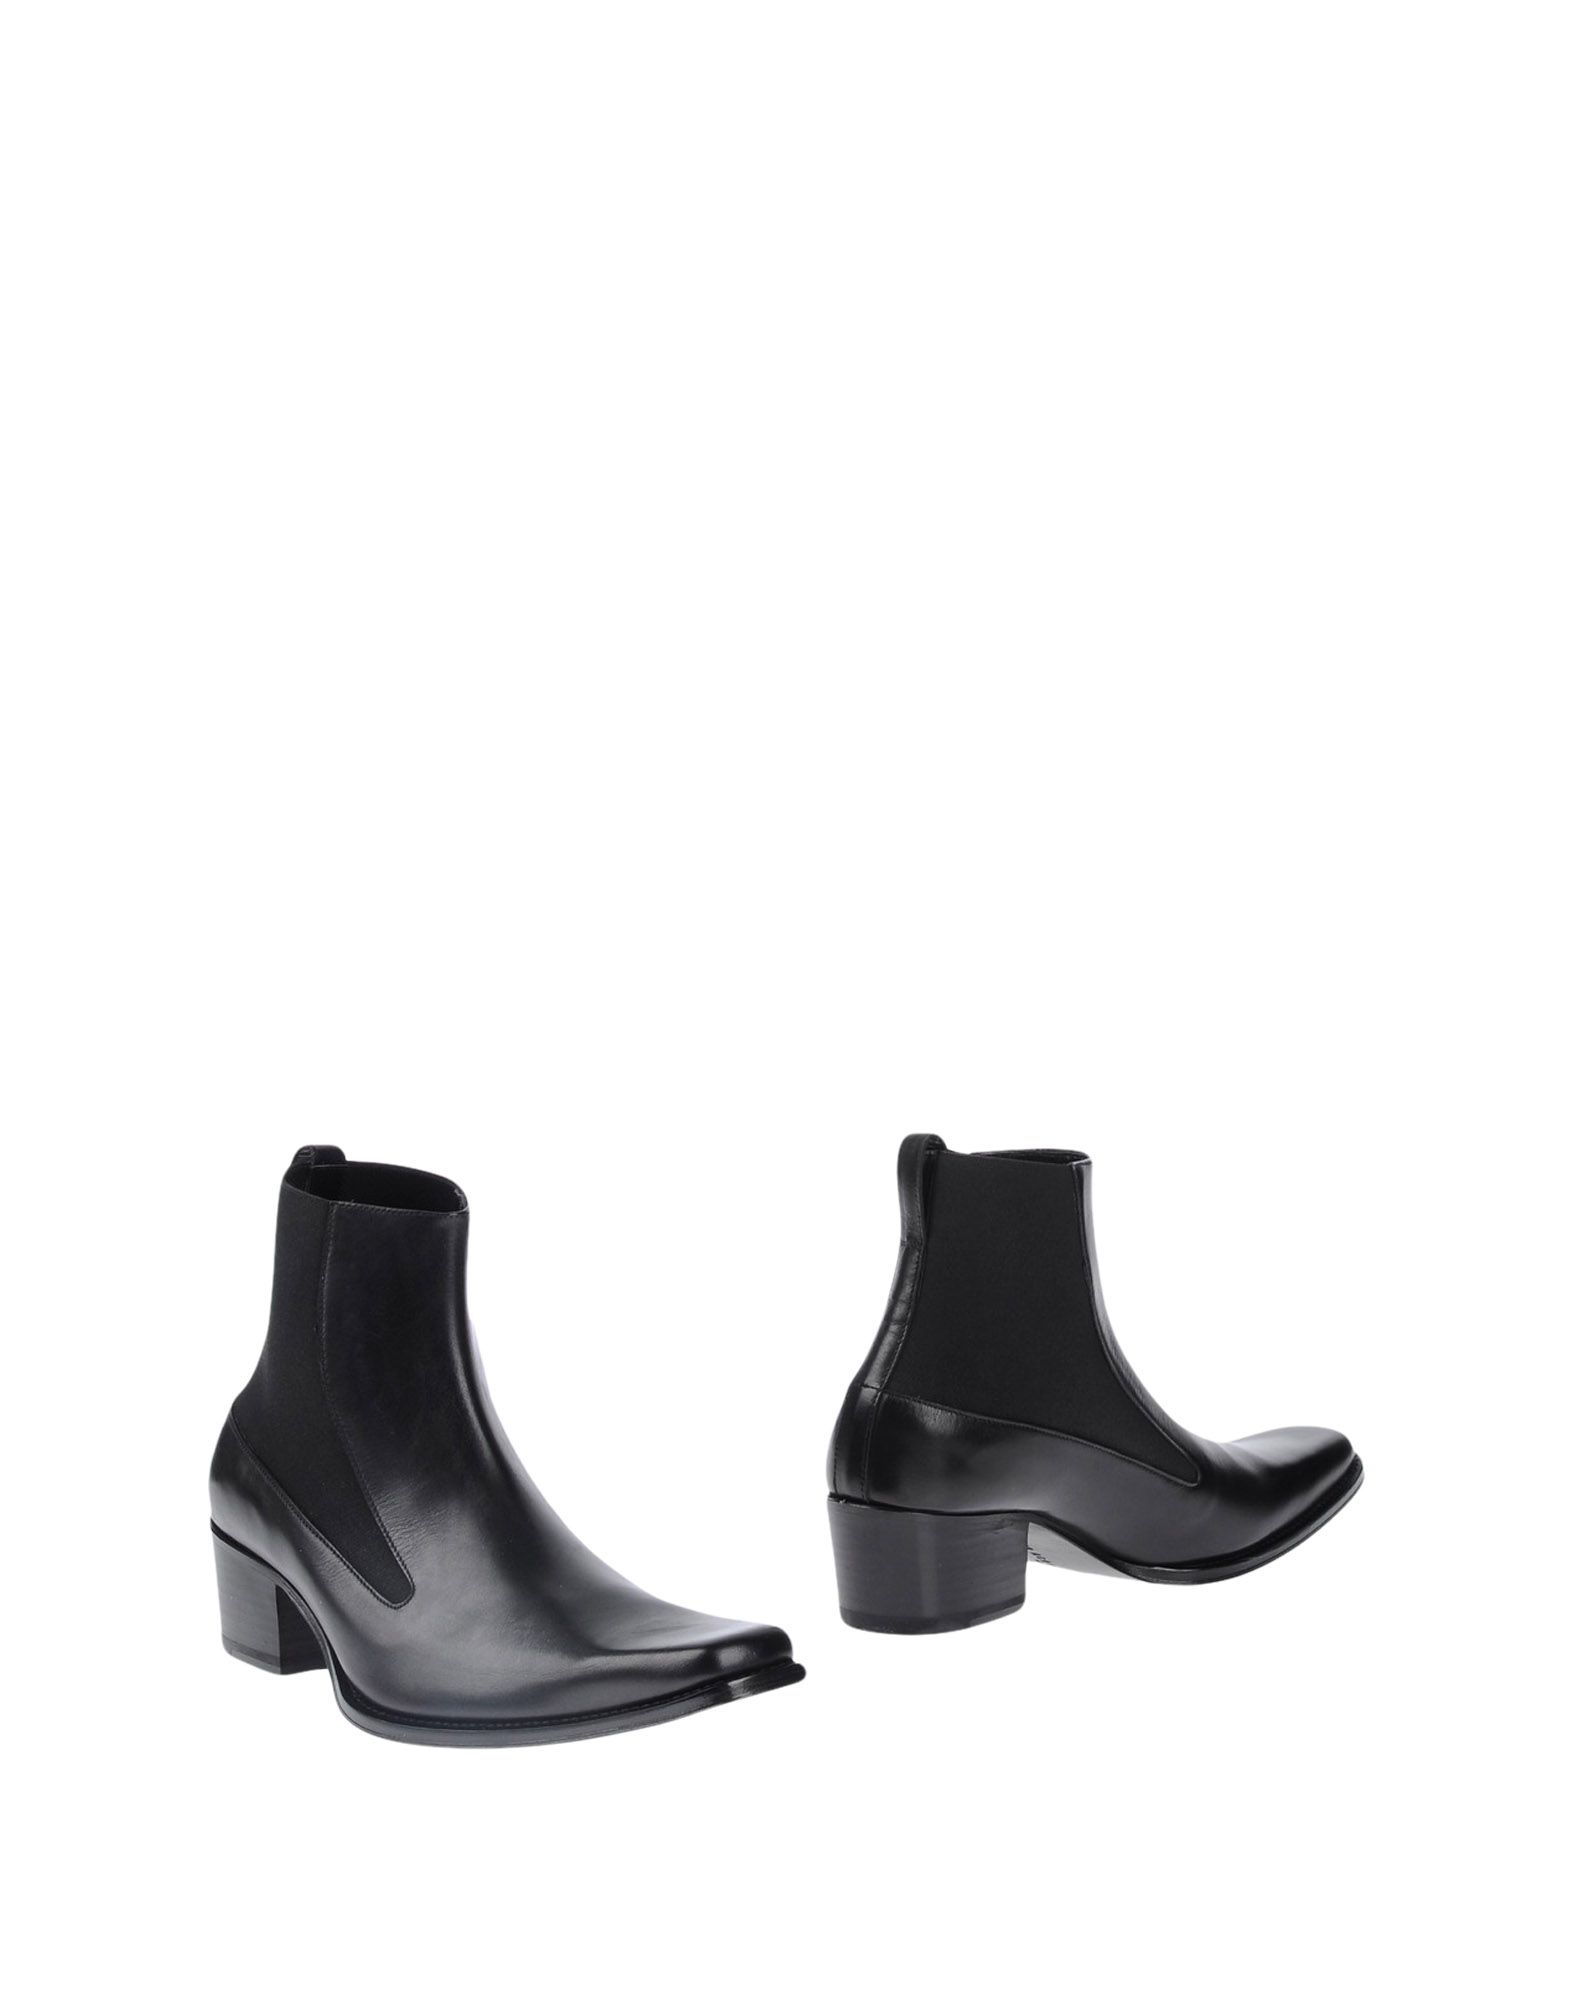 Lyst Haider Ackermann Ankle Boots In Black For Men